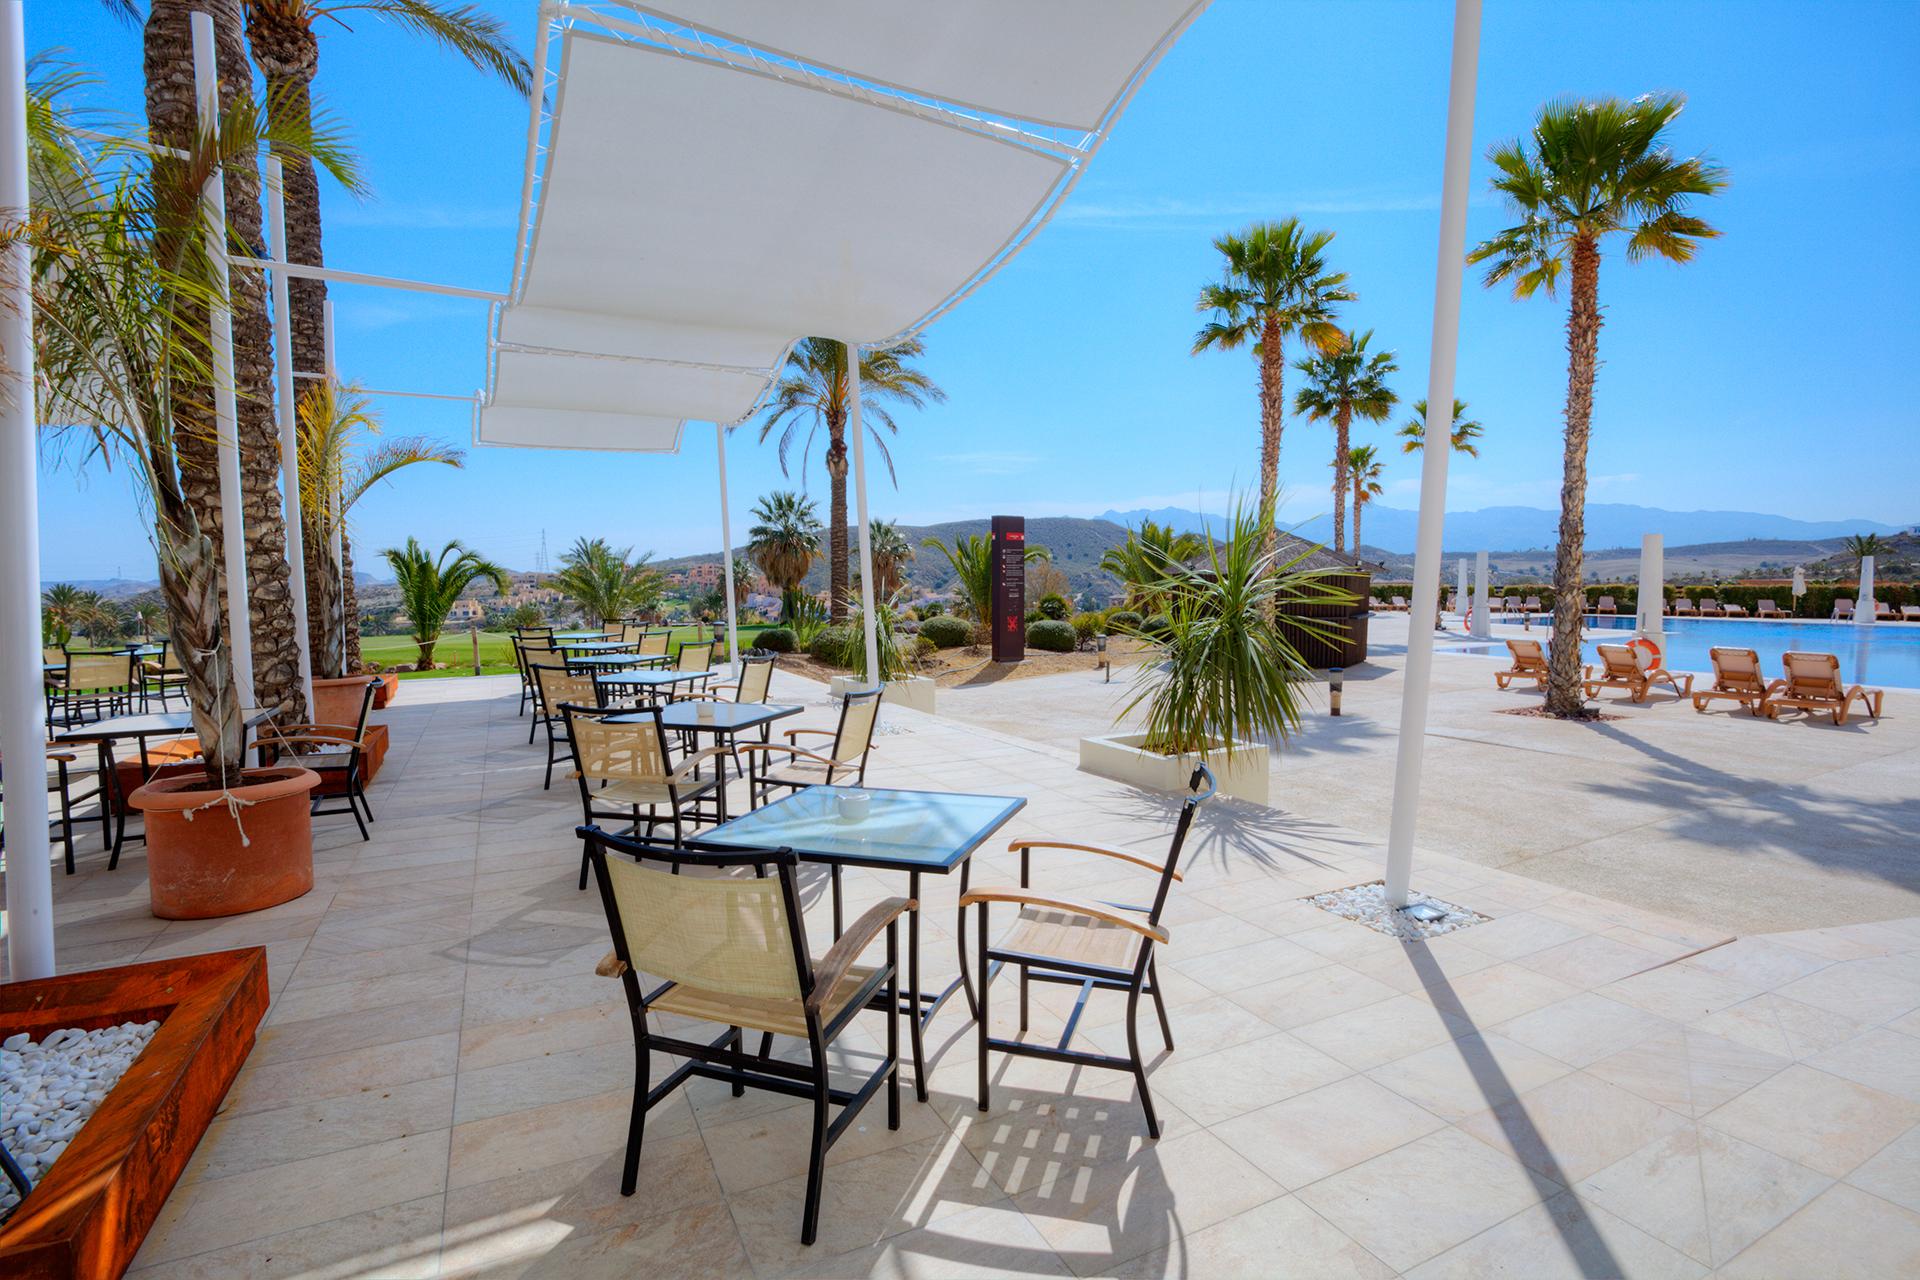 Golf-Expedition-Golf-reizen-Spanje-Regio-Valencia-Valle-Del-este-Golf-resort-terrace-1